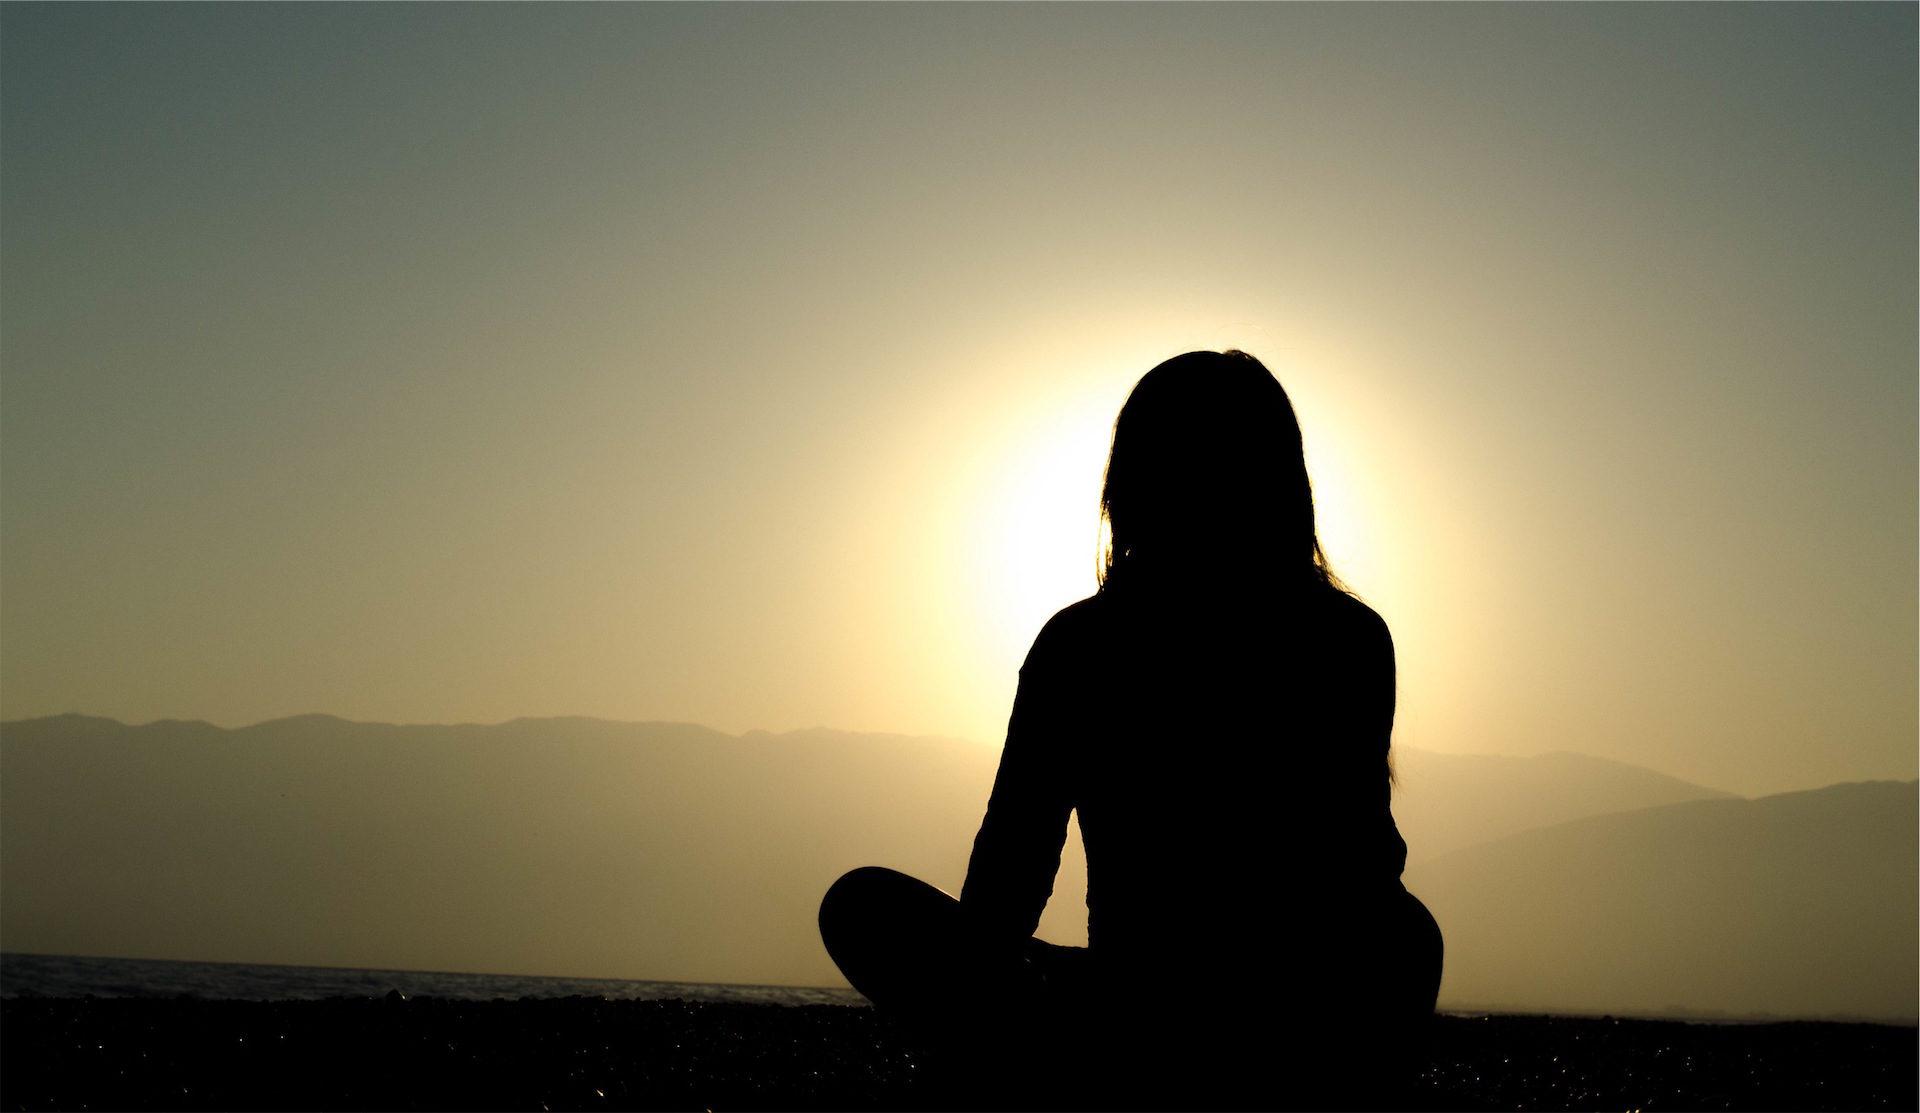 donna, Meditación, Yoga, Sole, Nirvana - Sfondi HD - Professor-falken.com